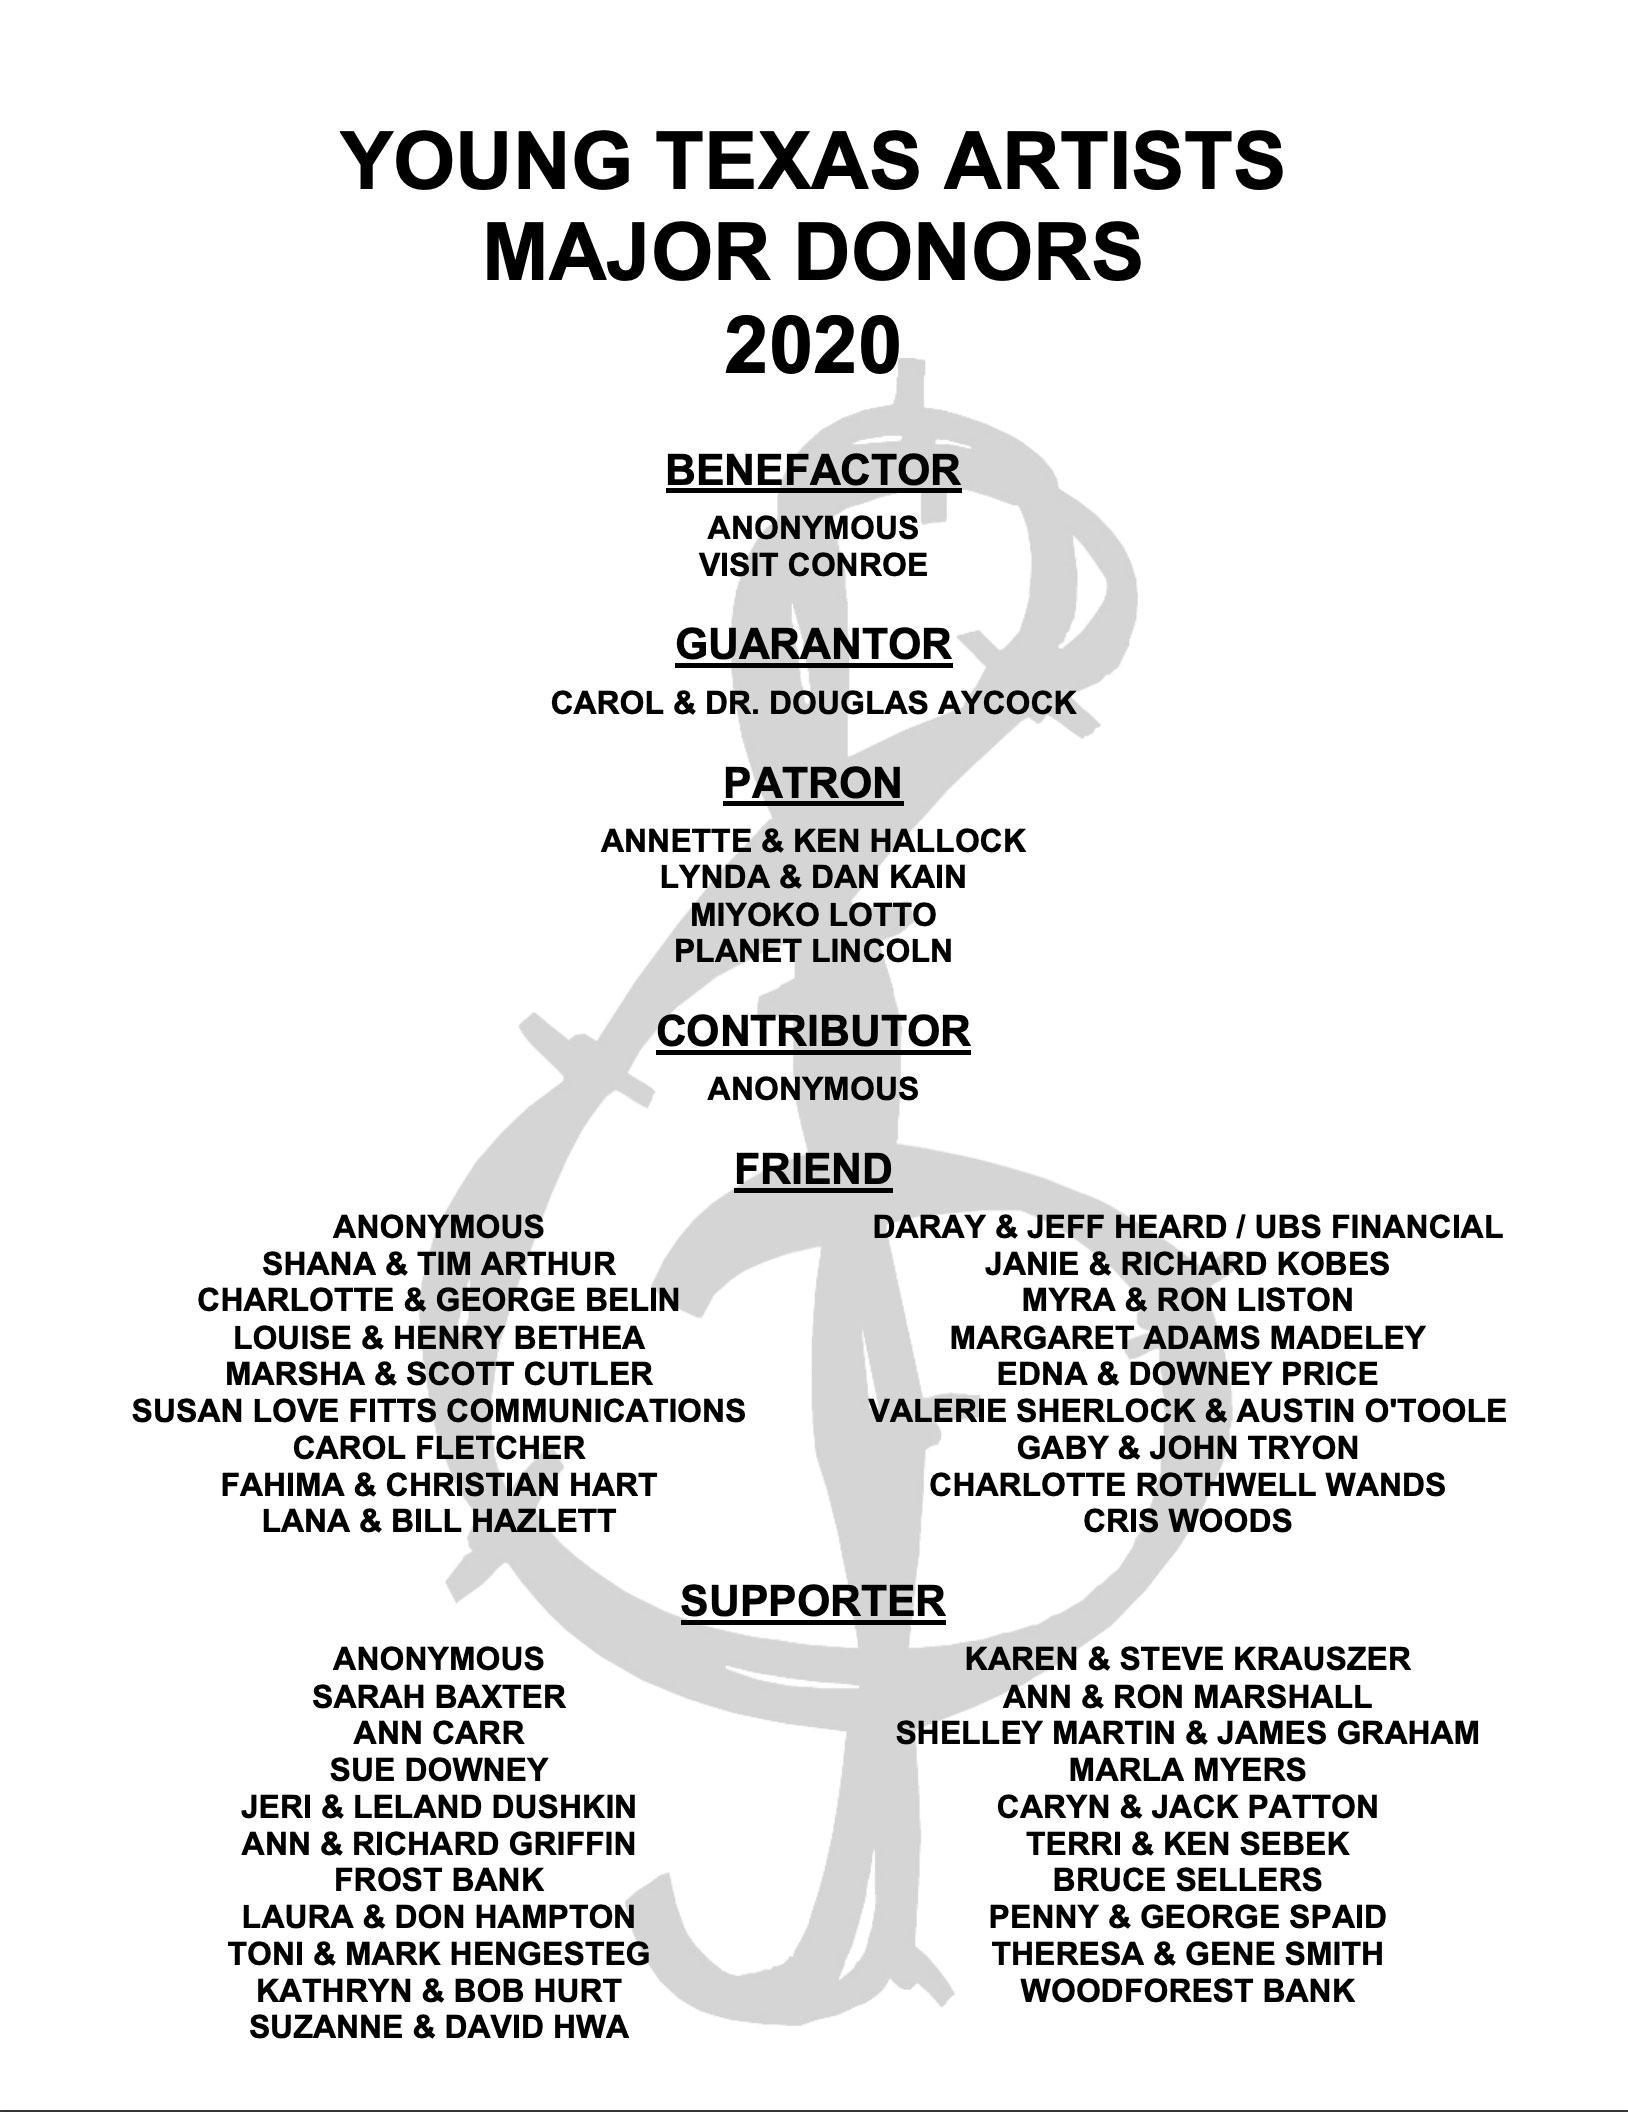 YTAMC-Major-Donors-2020.--05112020